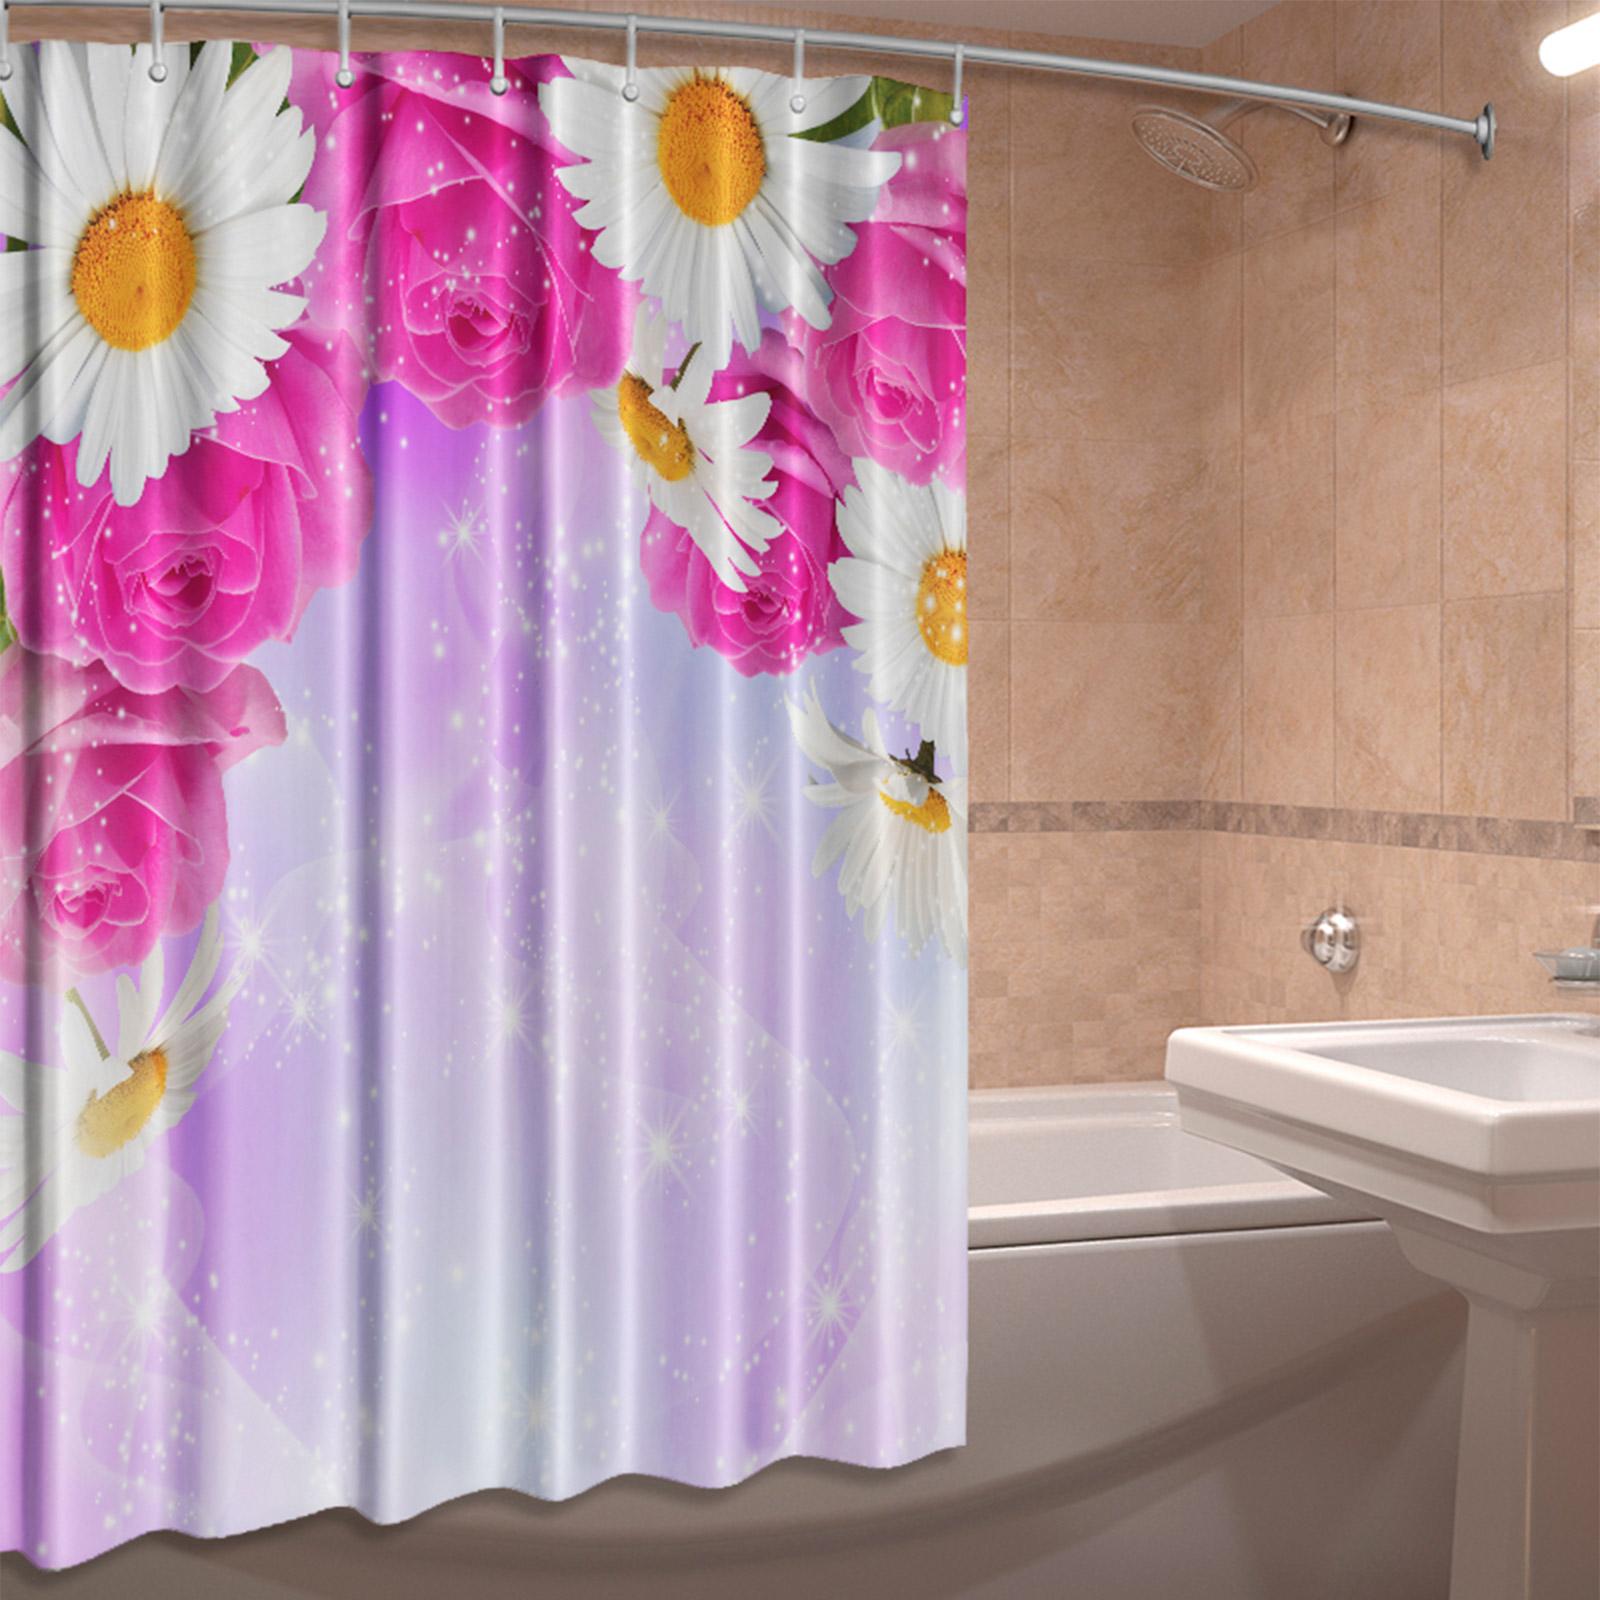 Штора для ванной комнаты «Розовая мечта»